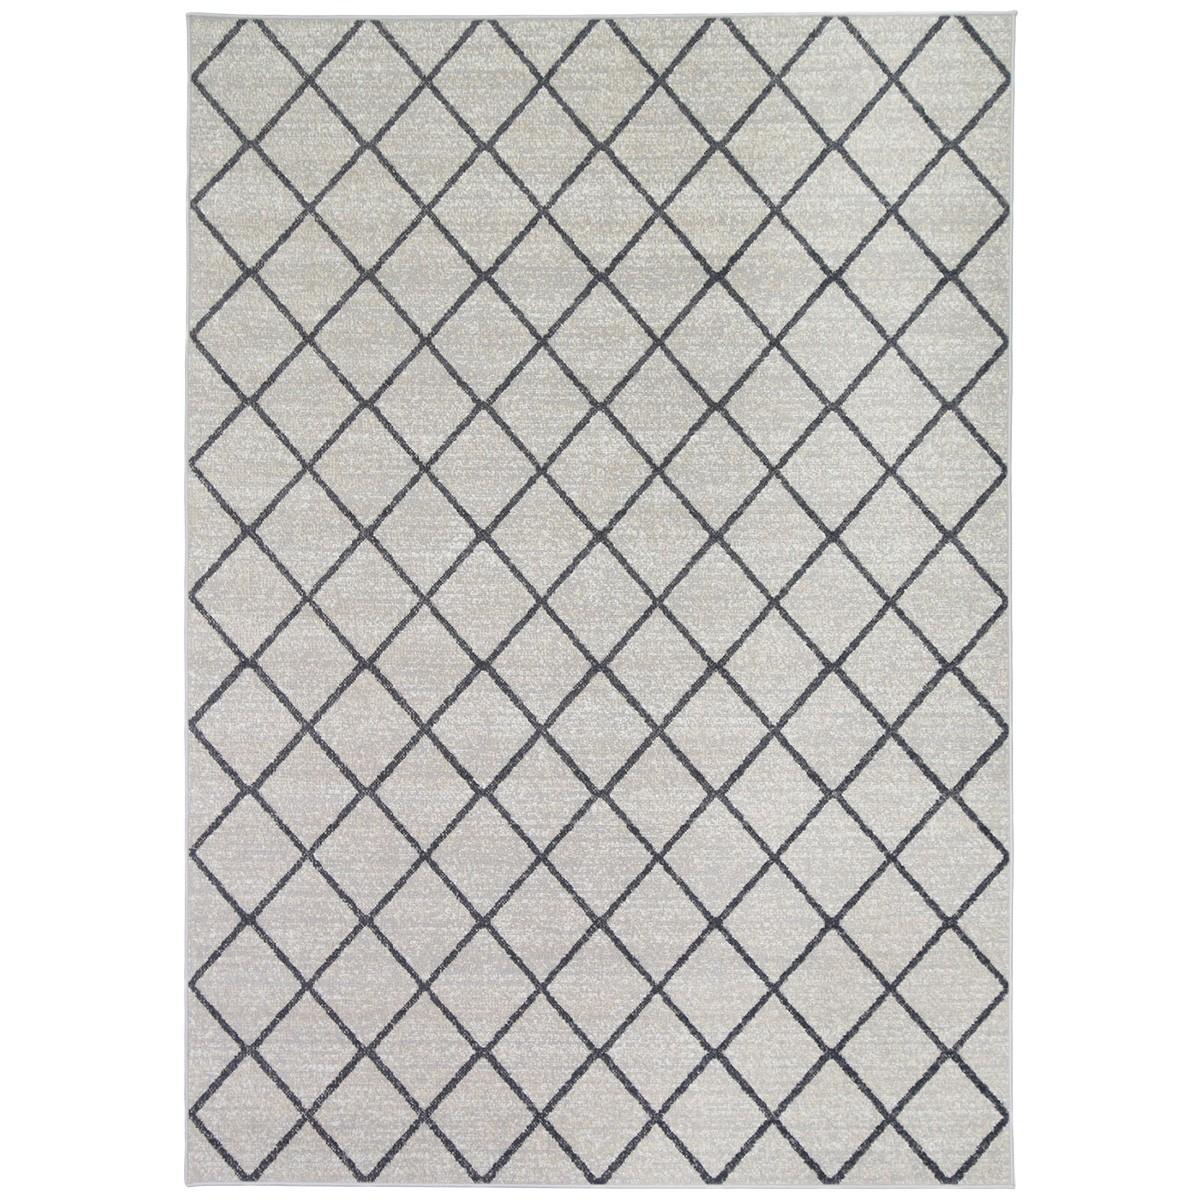 Courtyard Avleen Modern Rug, 150x80cm, Beige / Grey